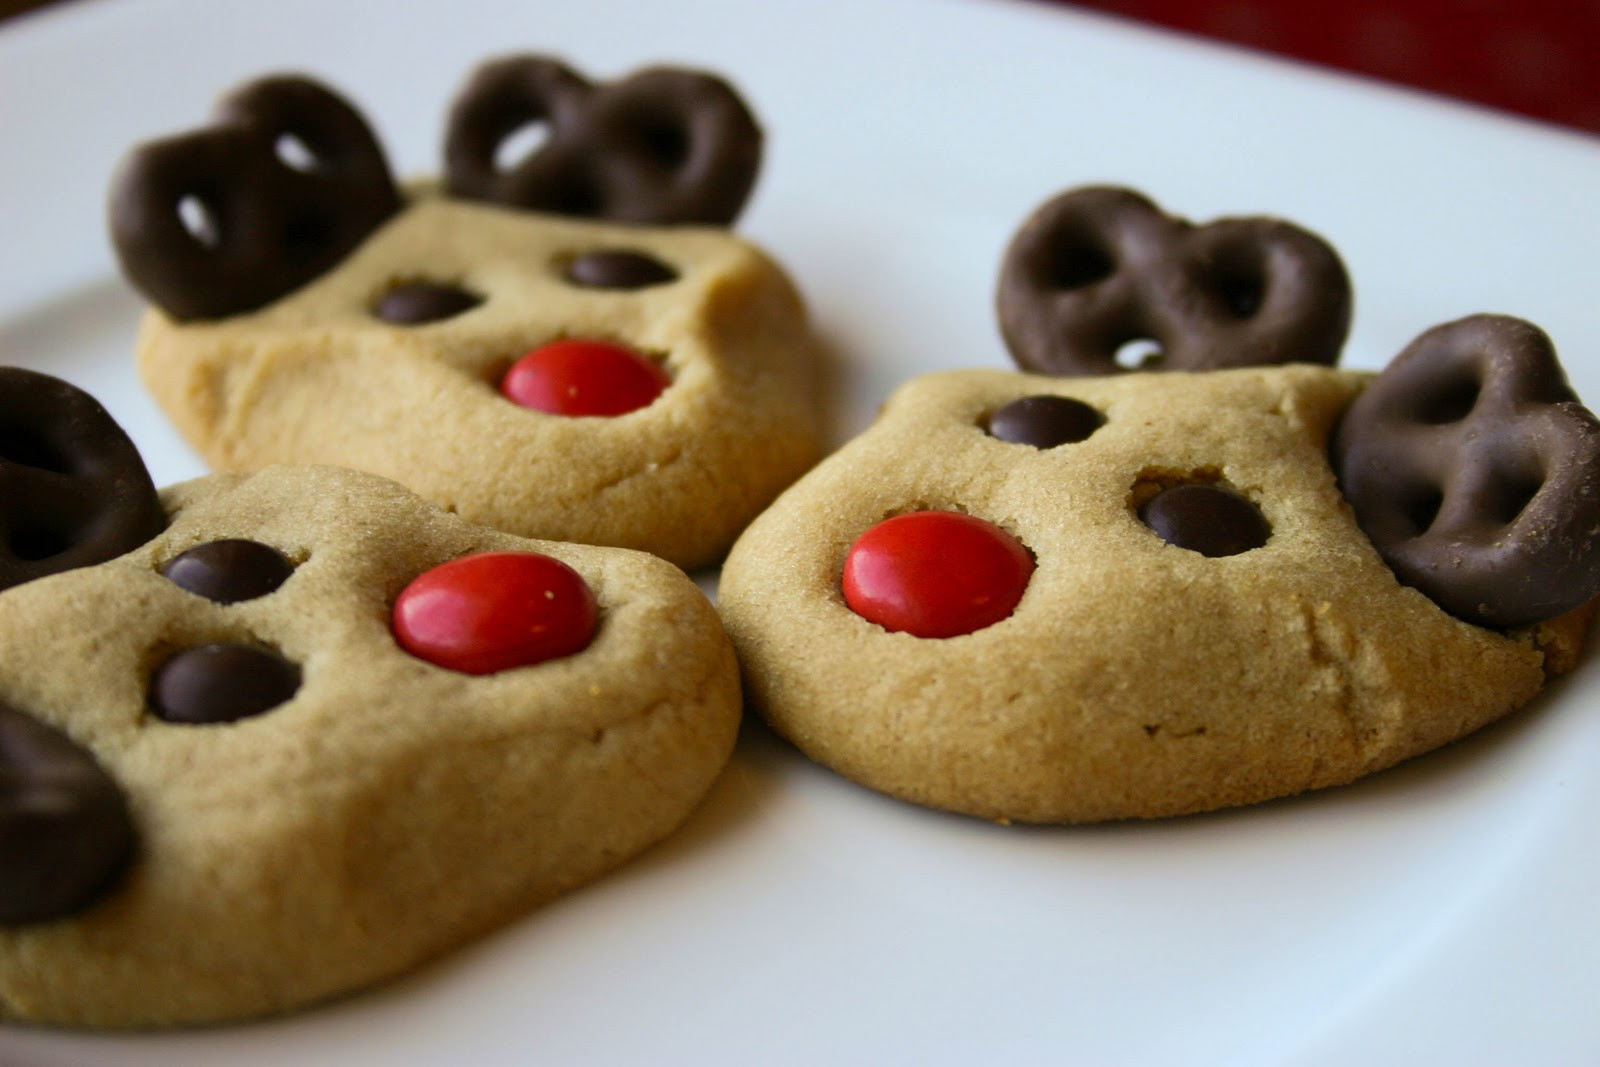 Cute Christmas Baking Ideas  Go Bake or Go Home Inspirational Holidays